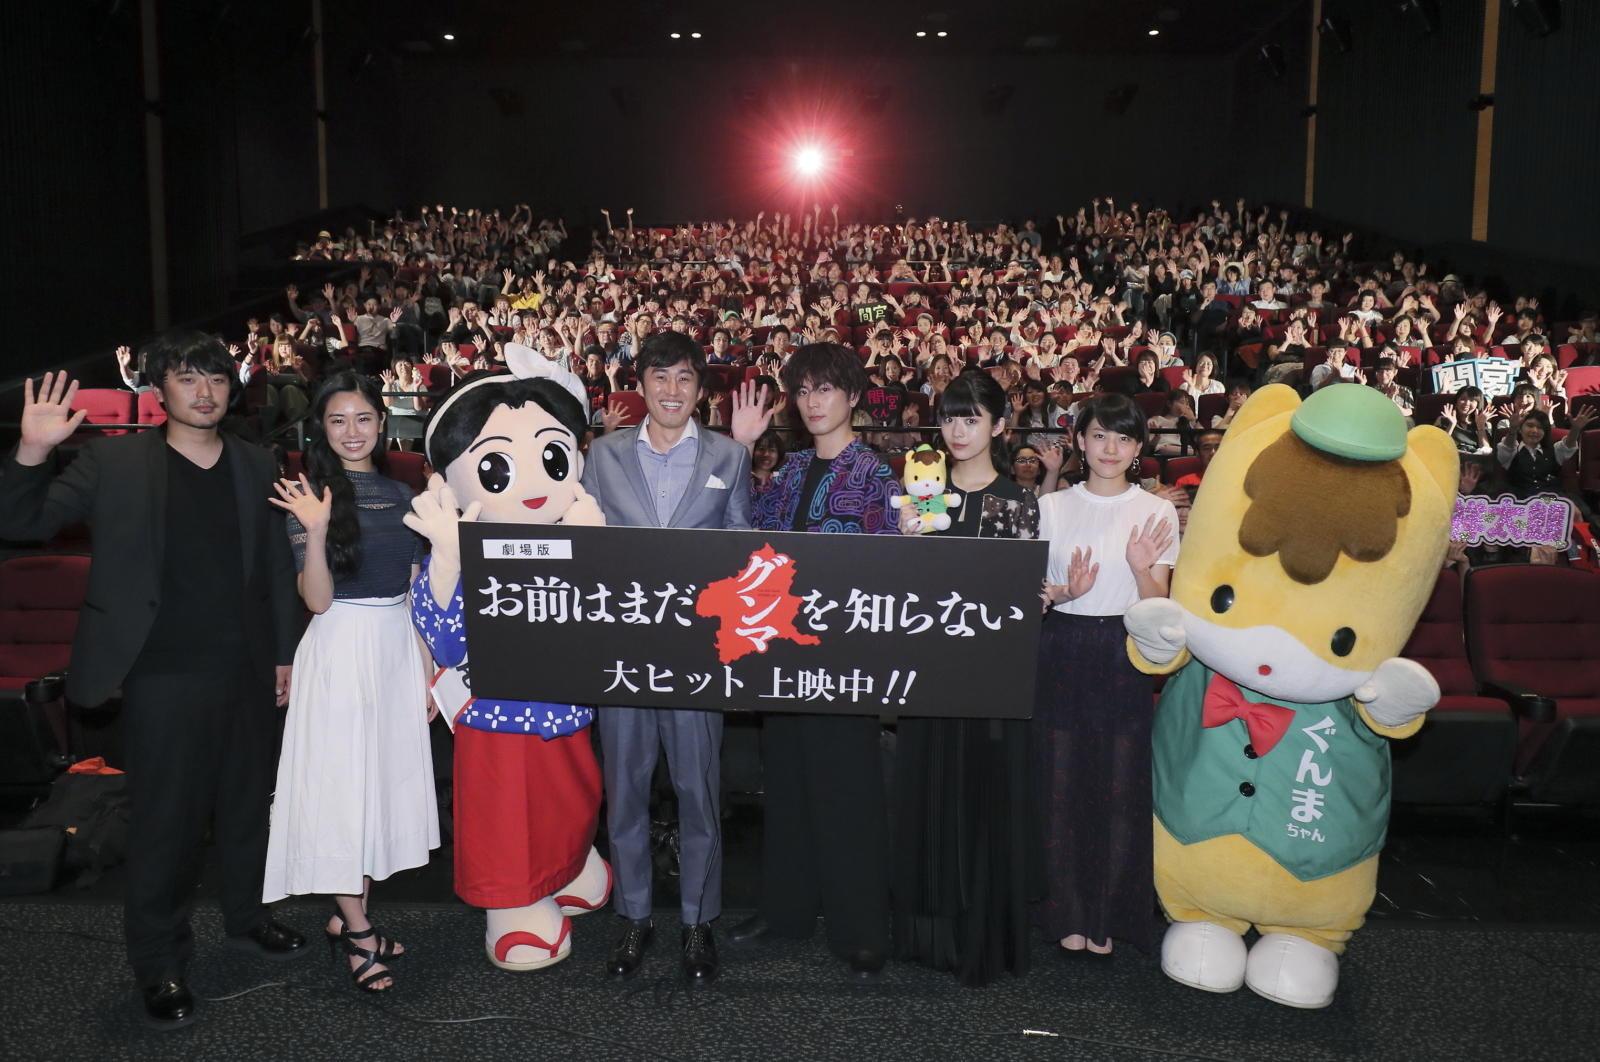 http://news.yoshimoto.co.jp/20170716170832-707639fb8999ea6e032f3bcdeee628c8914acdbf.jpg